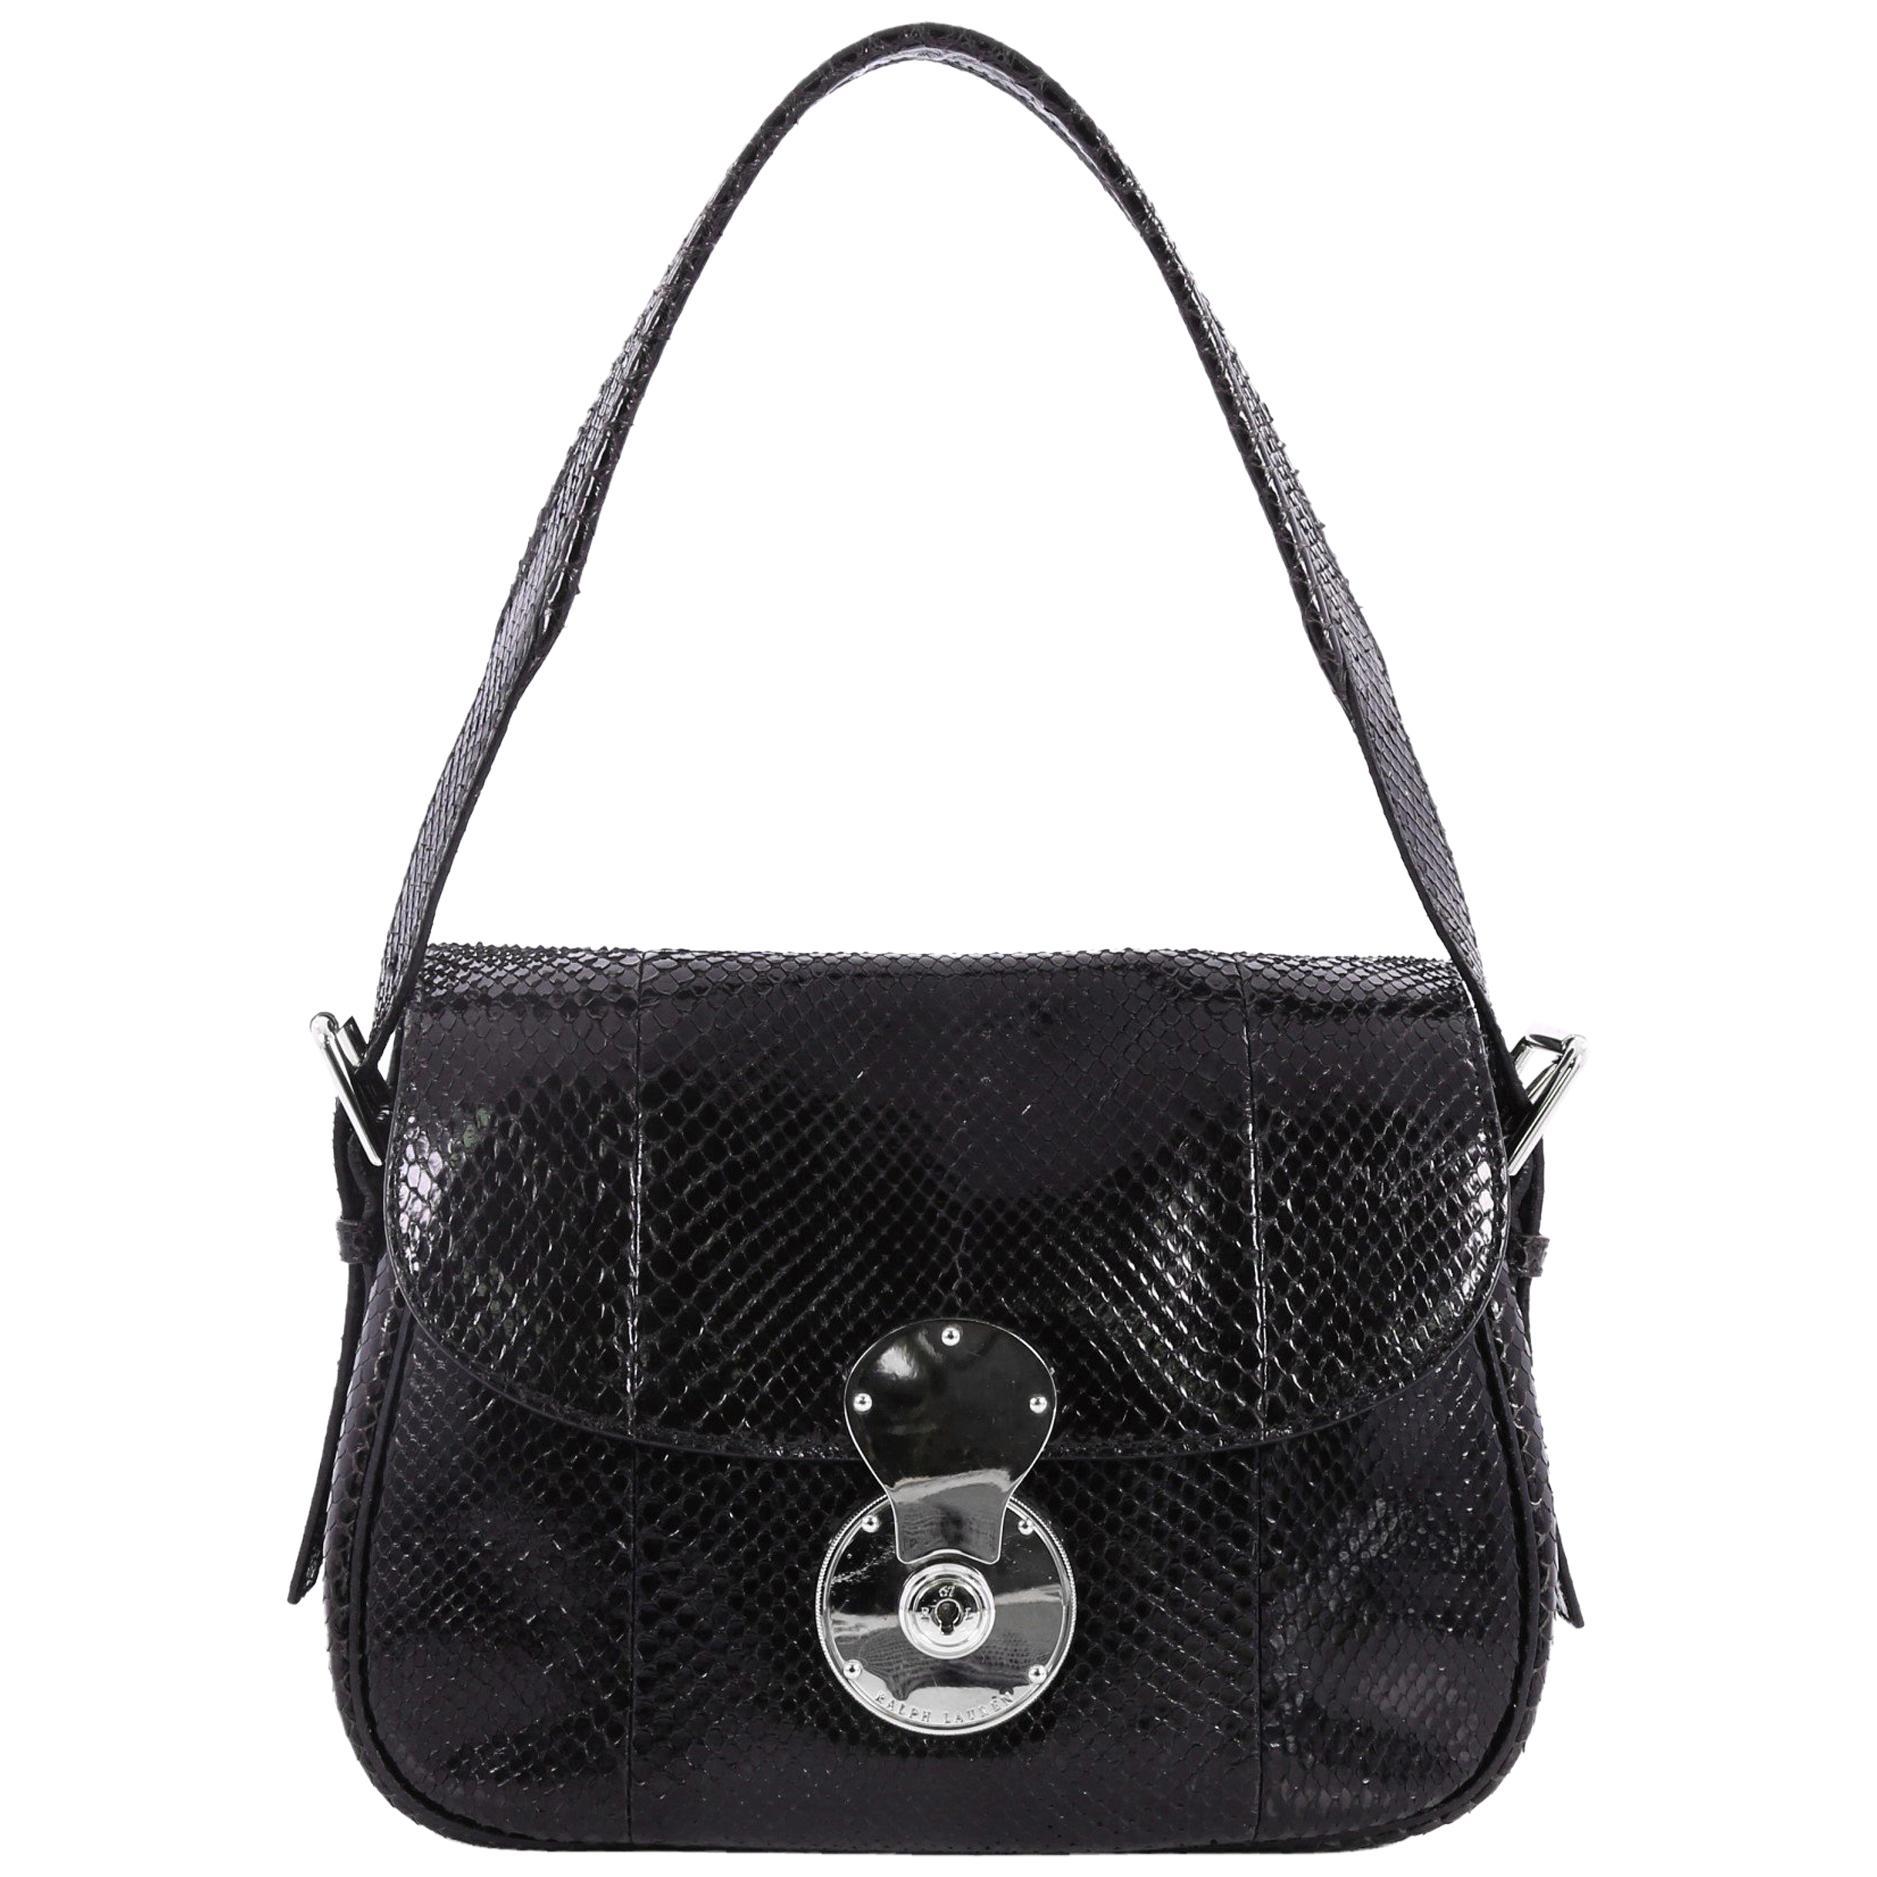 Ralph Lauren Collection Ricky Convertible Flap Bag Python Medium